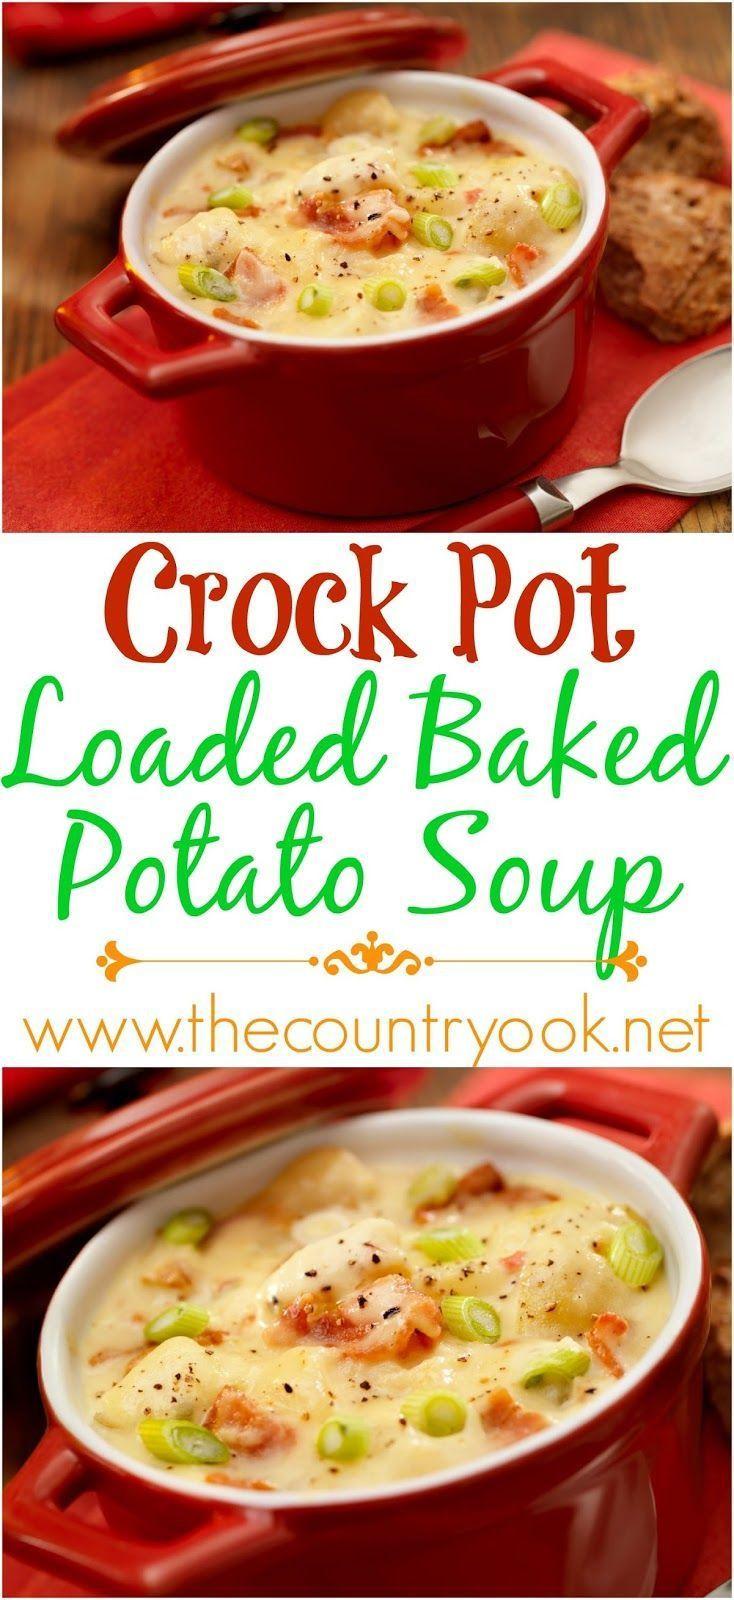 Crockpot Potato Soup Healthy  311 best fort Food images on Pinterest